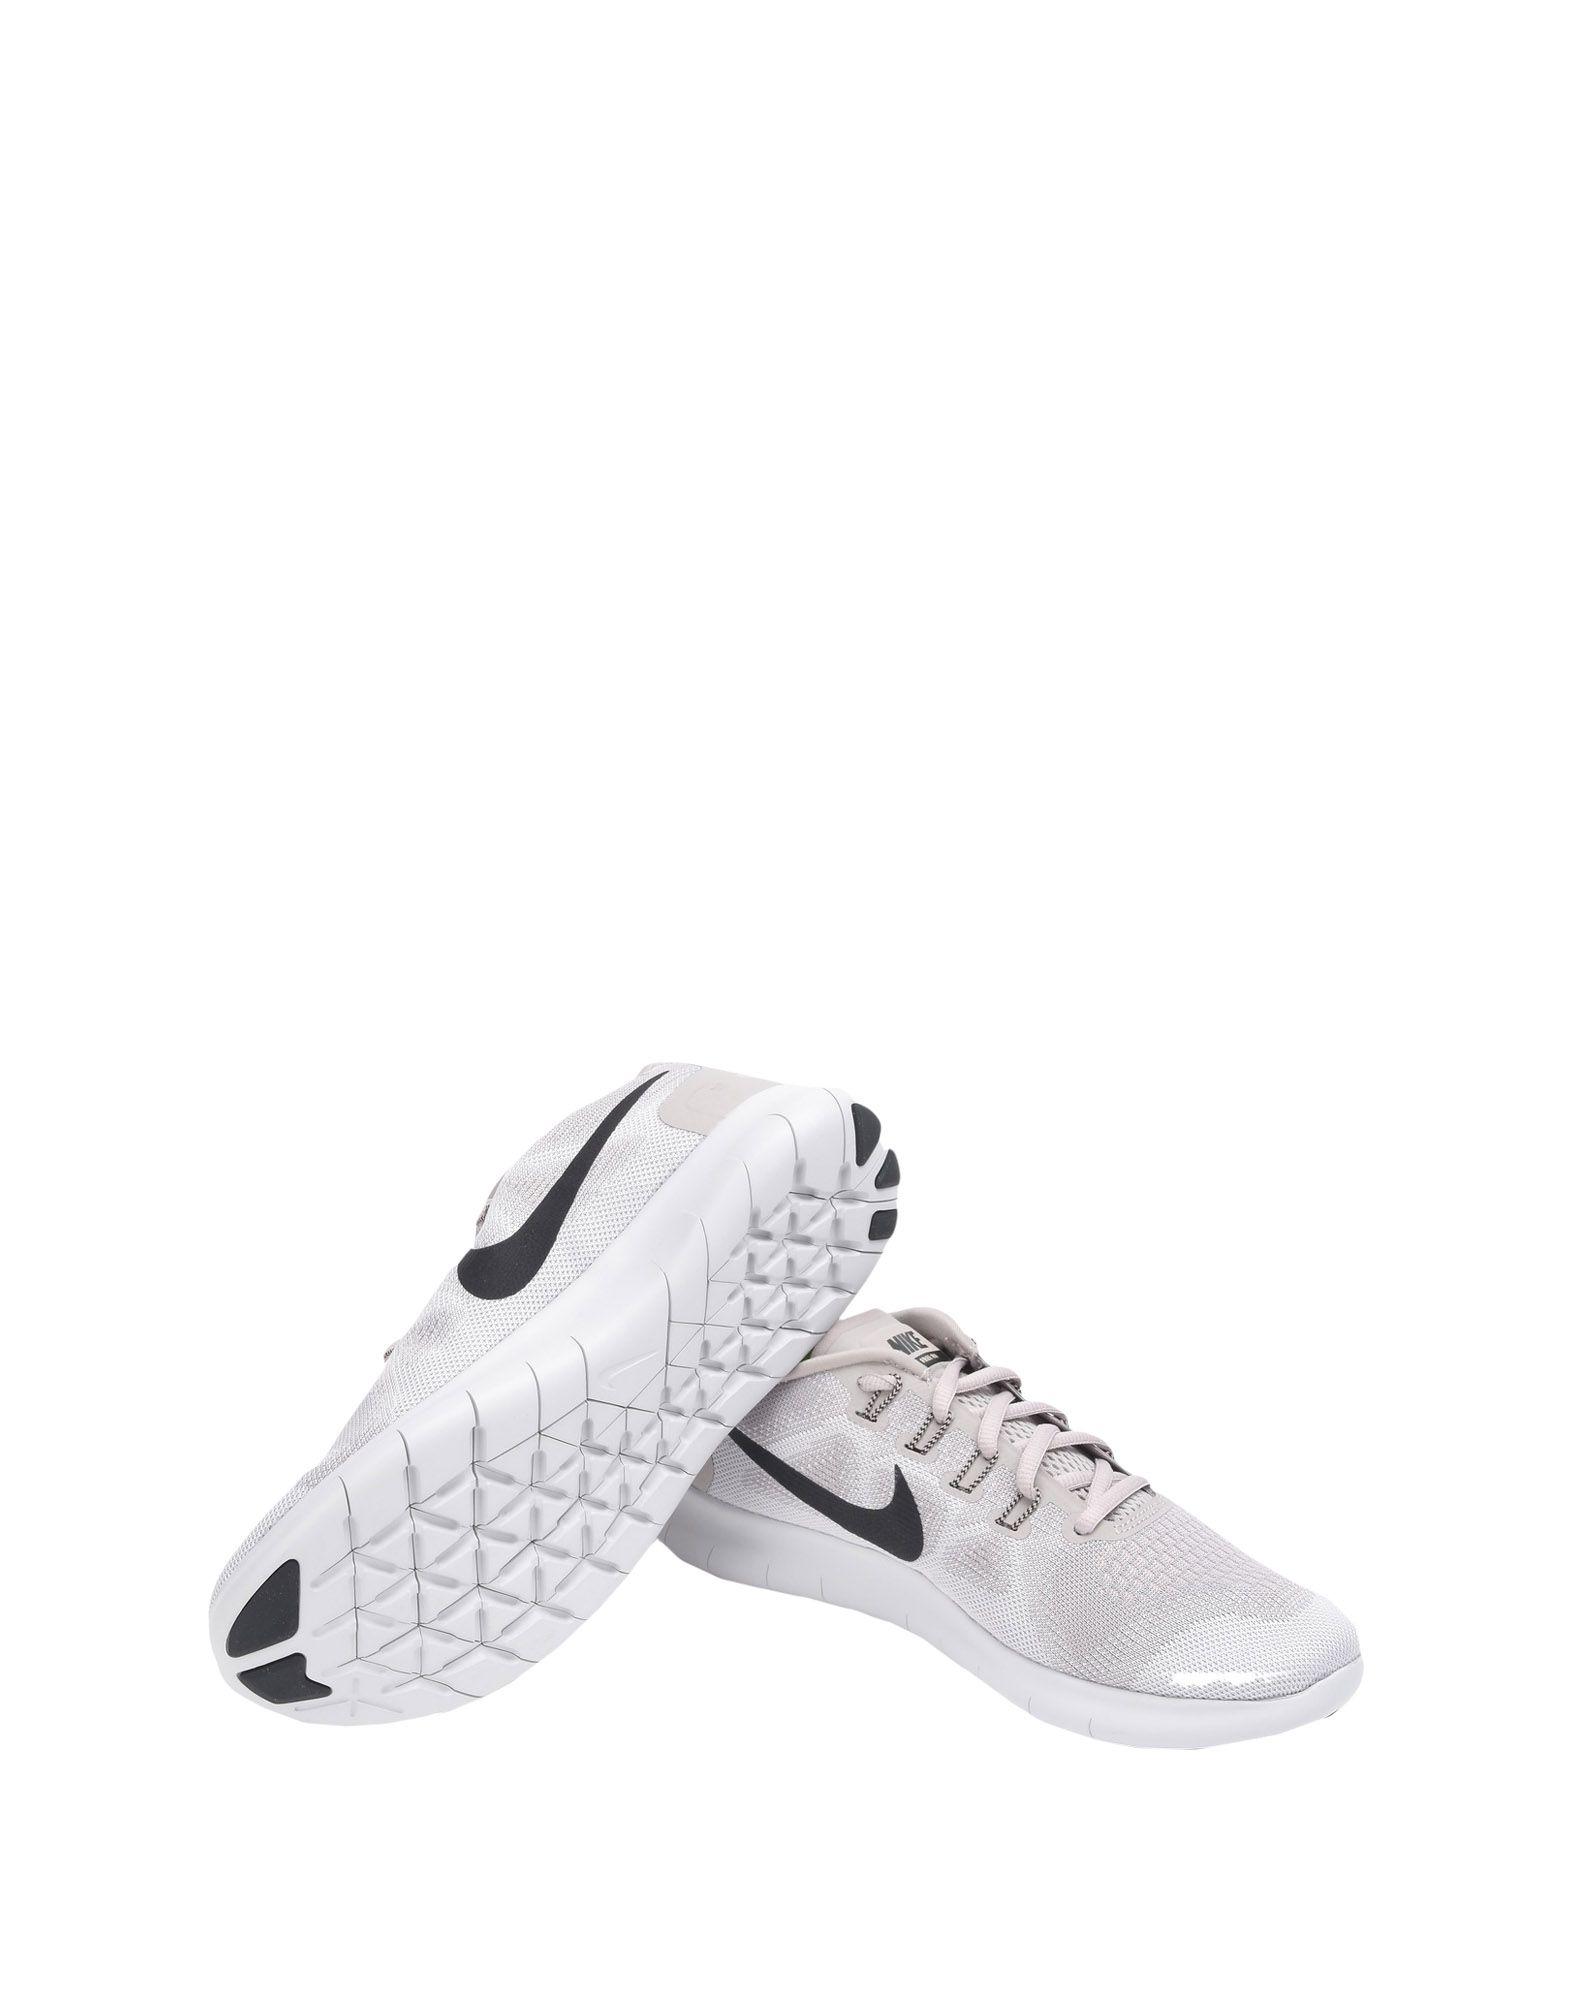 Nike   Free Gute Run 2017  11441004OR Gute Free Qualität beliebte Schuhe 446e6b